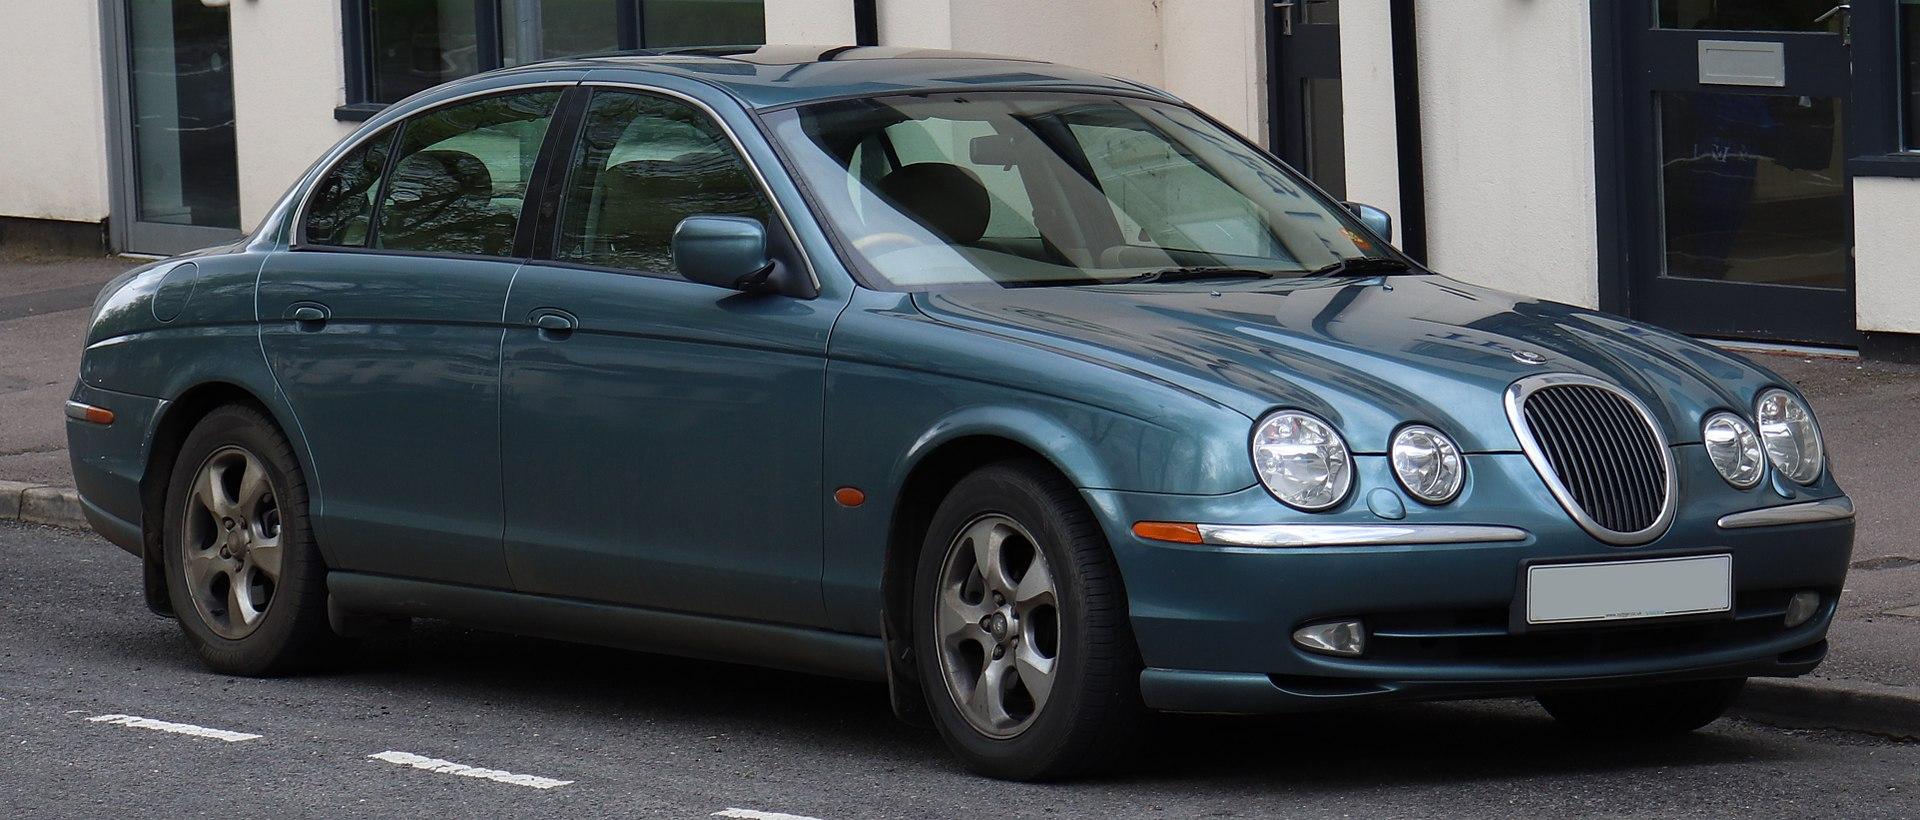 2001 Jaguar S-Type V6 SE Automatic 3.0 Front.jpg